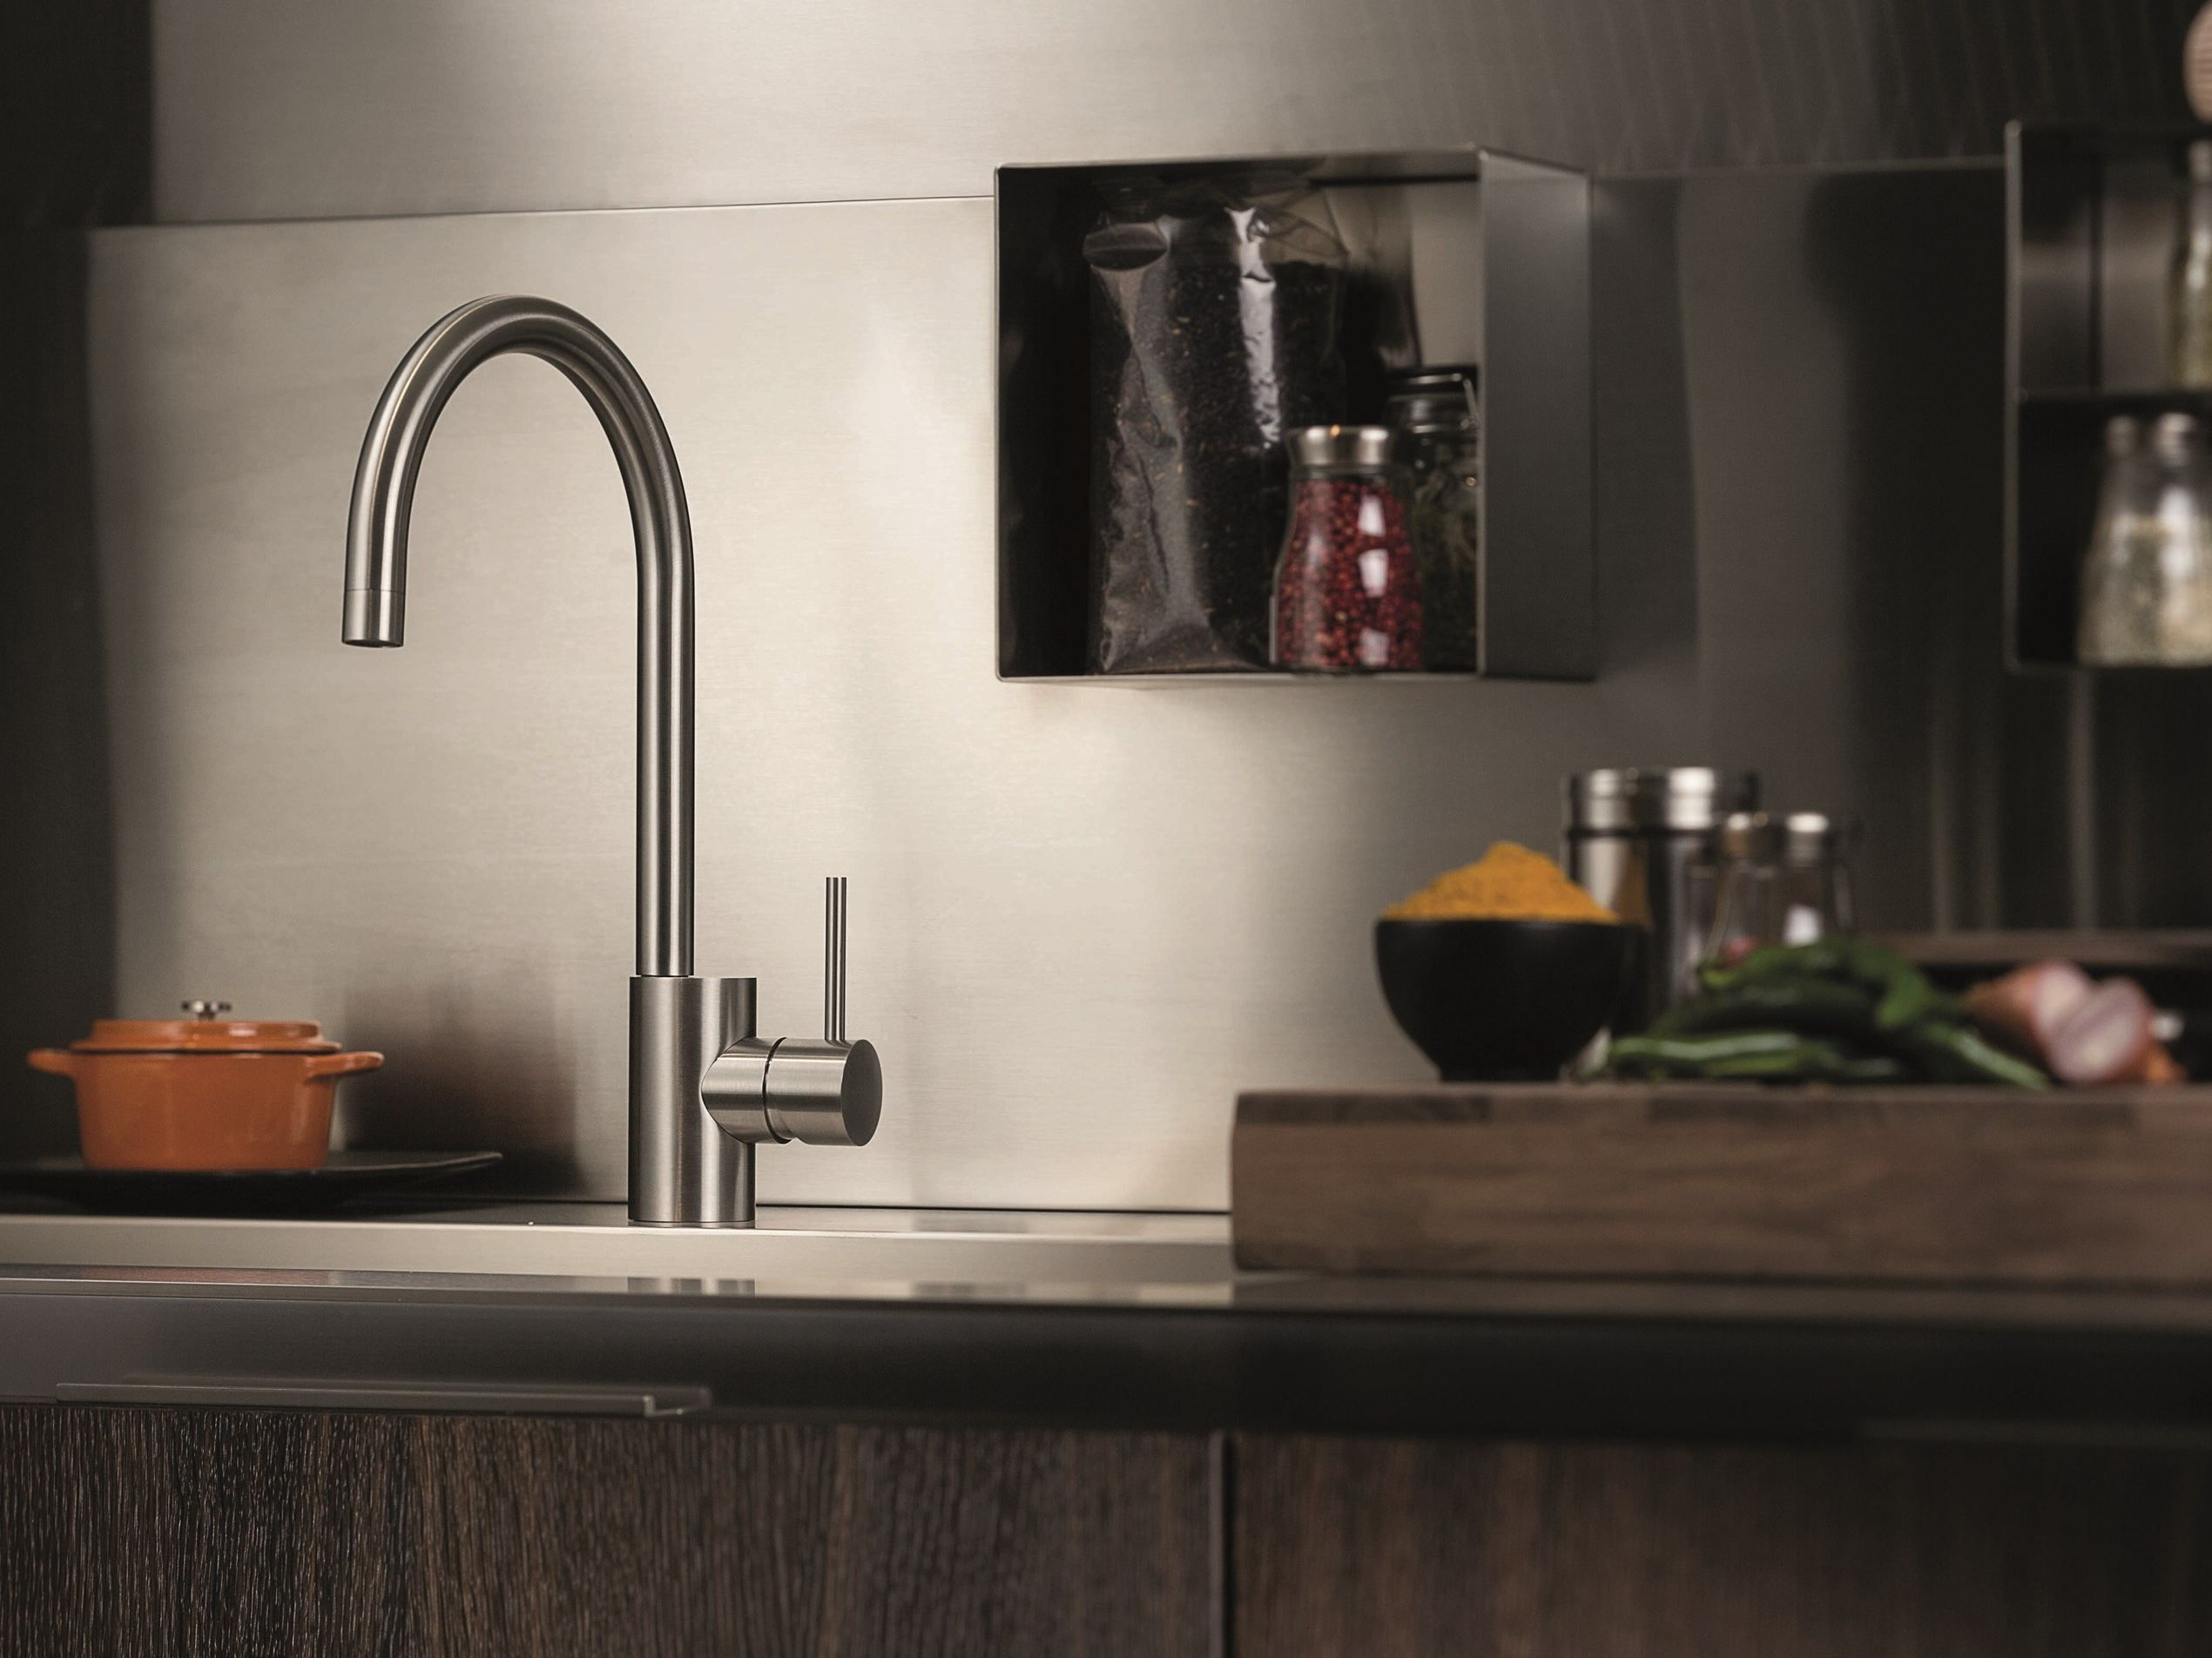 X-MIX Miscelatore da cucina by #NEWFORM #kitchen #design | X-MIX ...